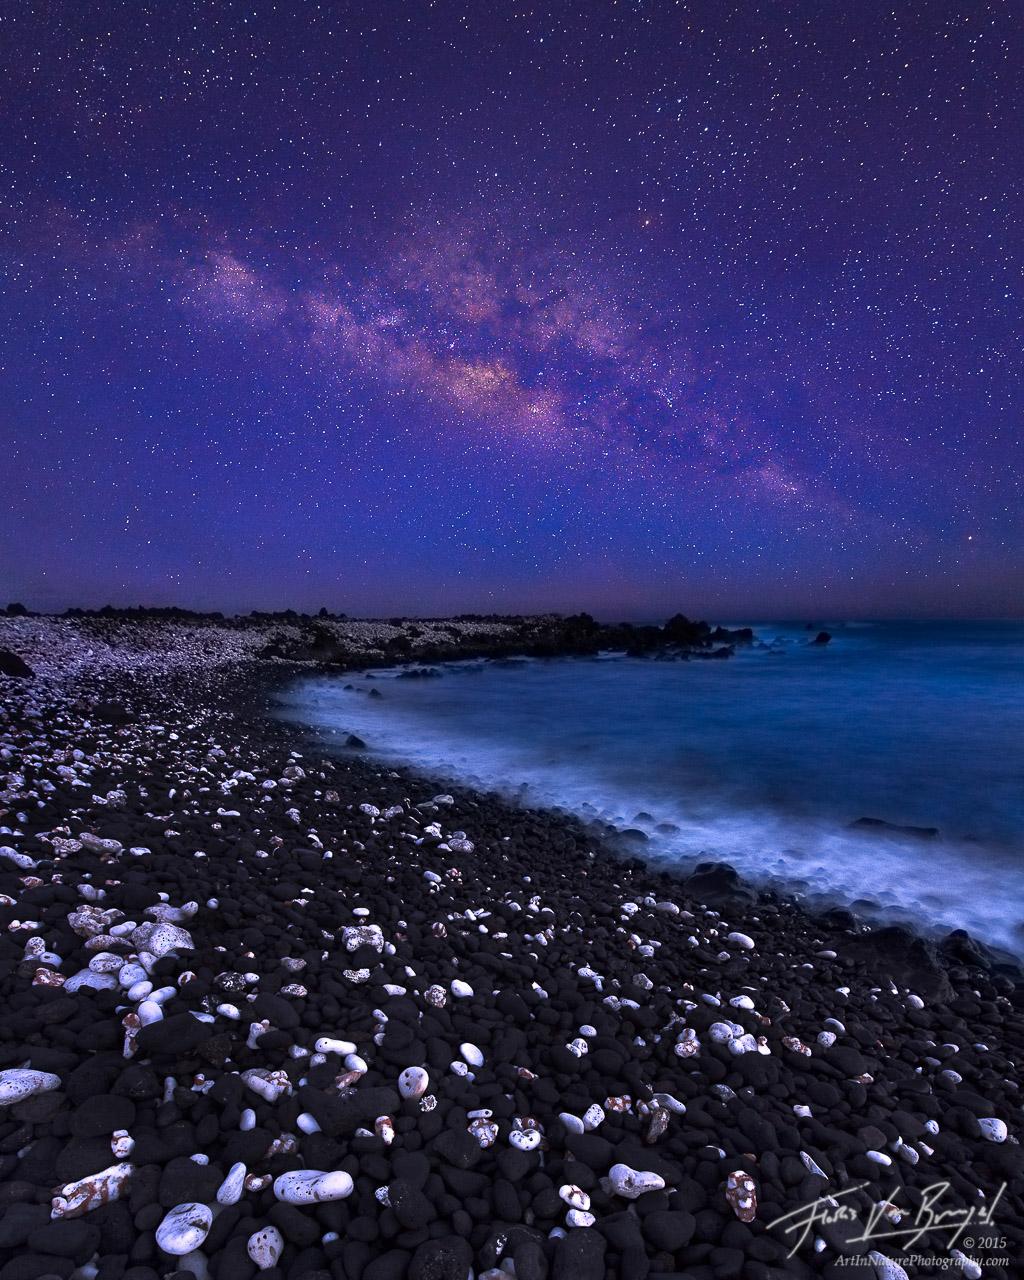 Milky Way, Maui, Hawaii, beach, photo